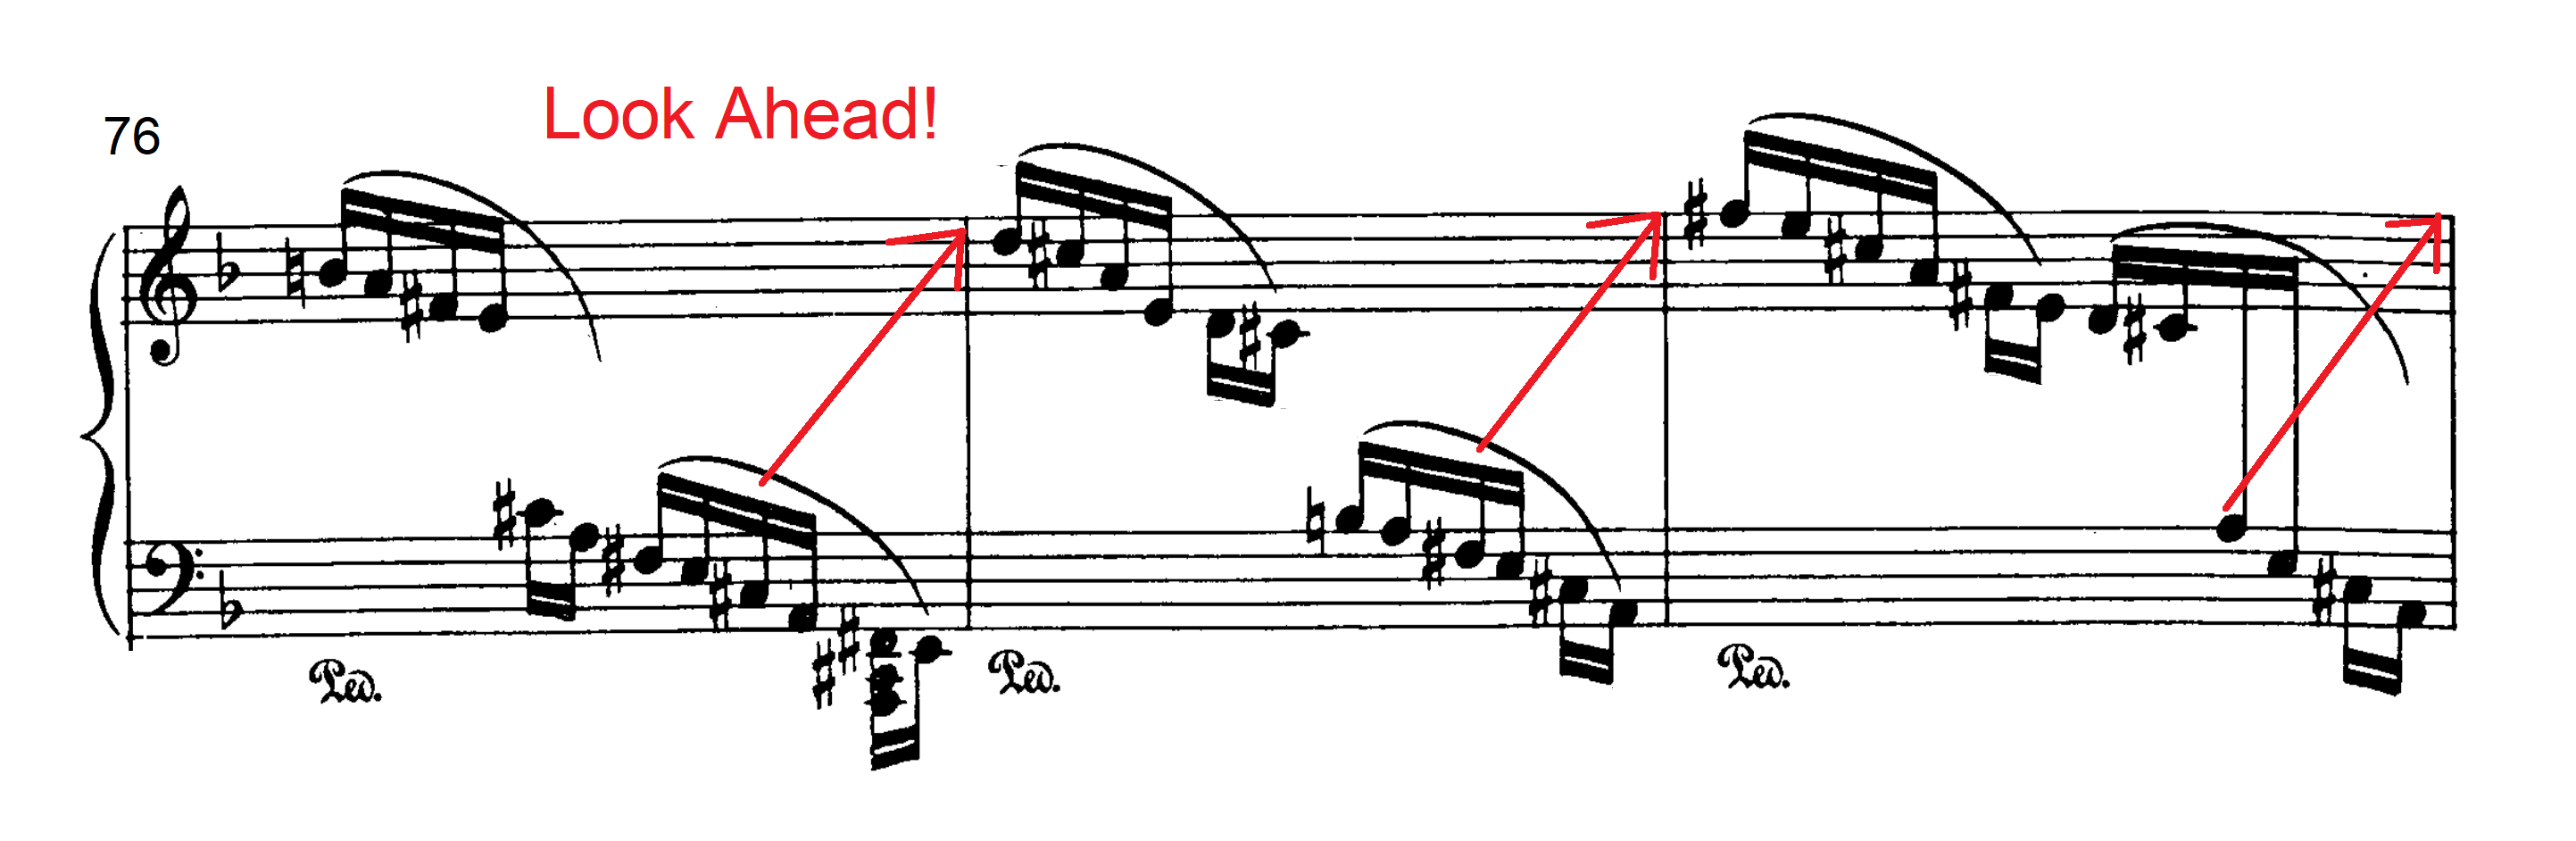 Tchaikovsky Piano Concerto No.1 Masterclass 2.6